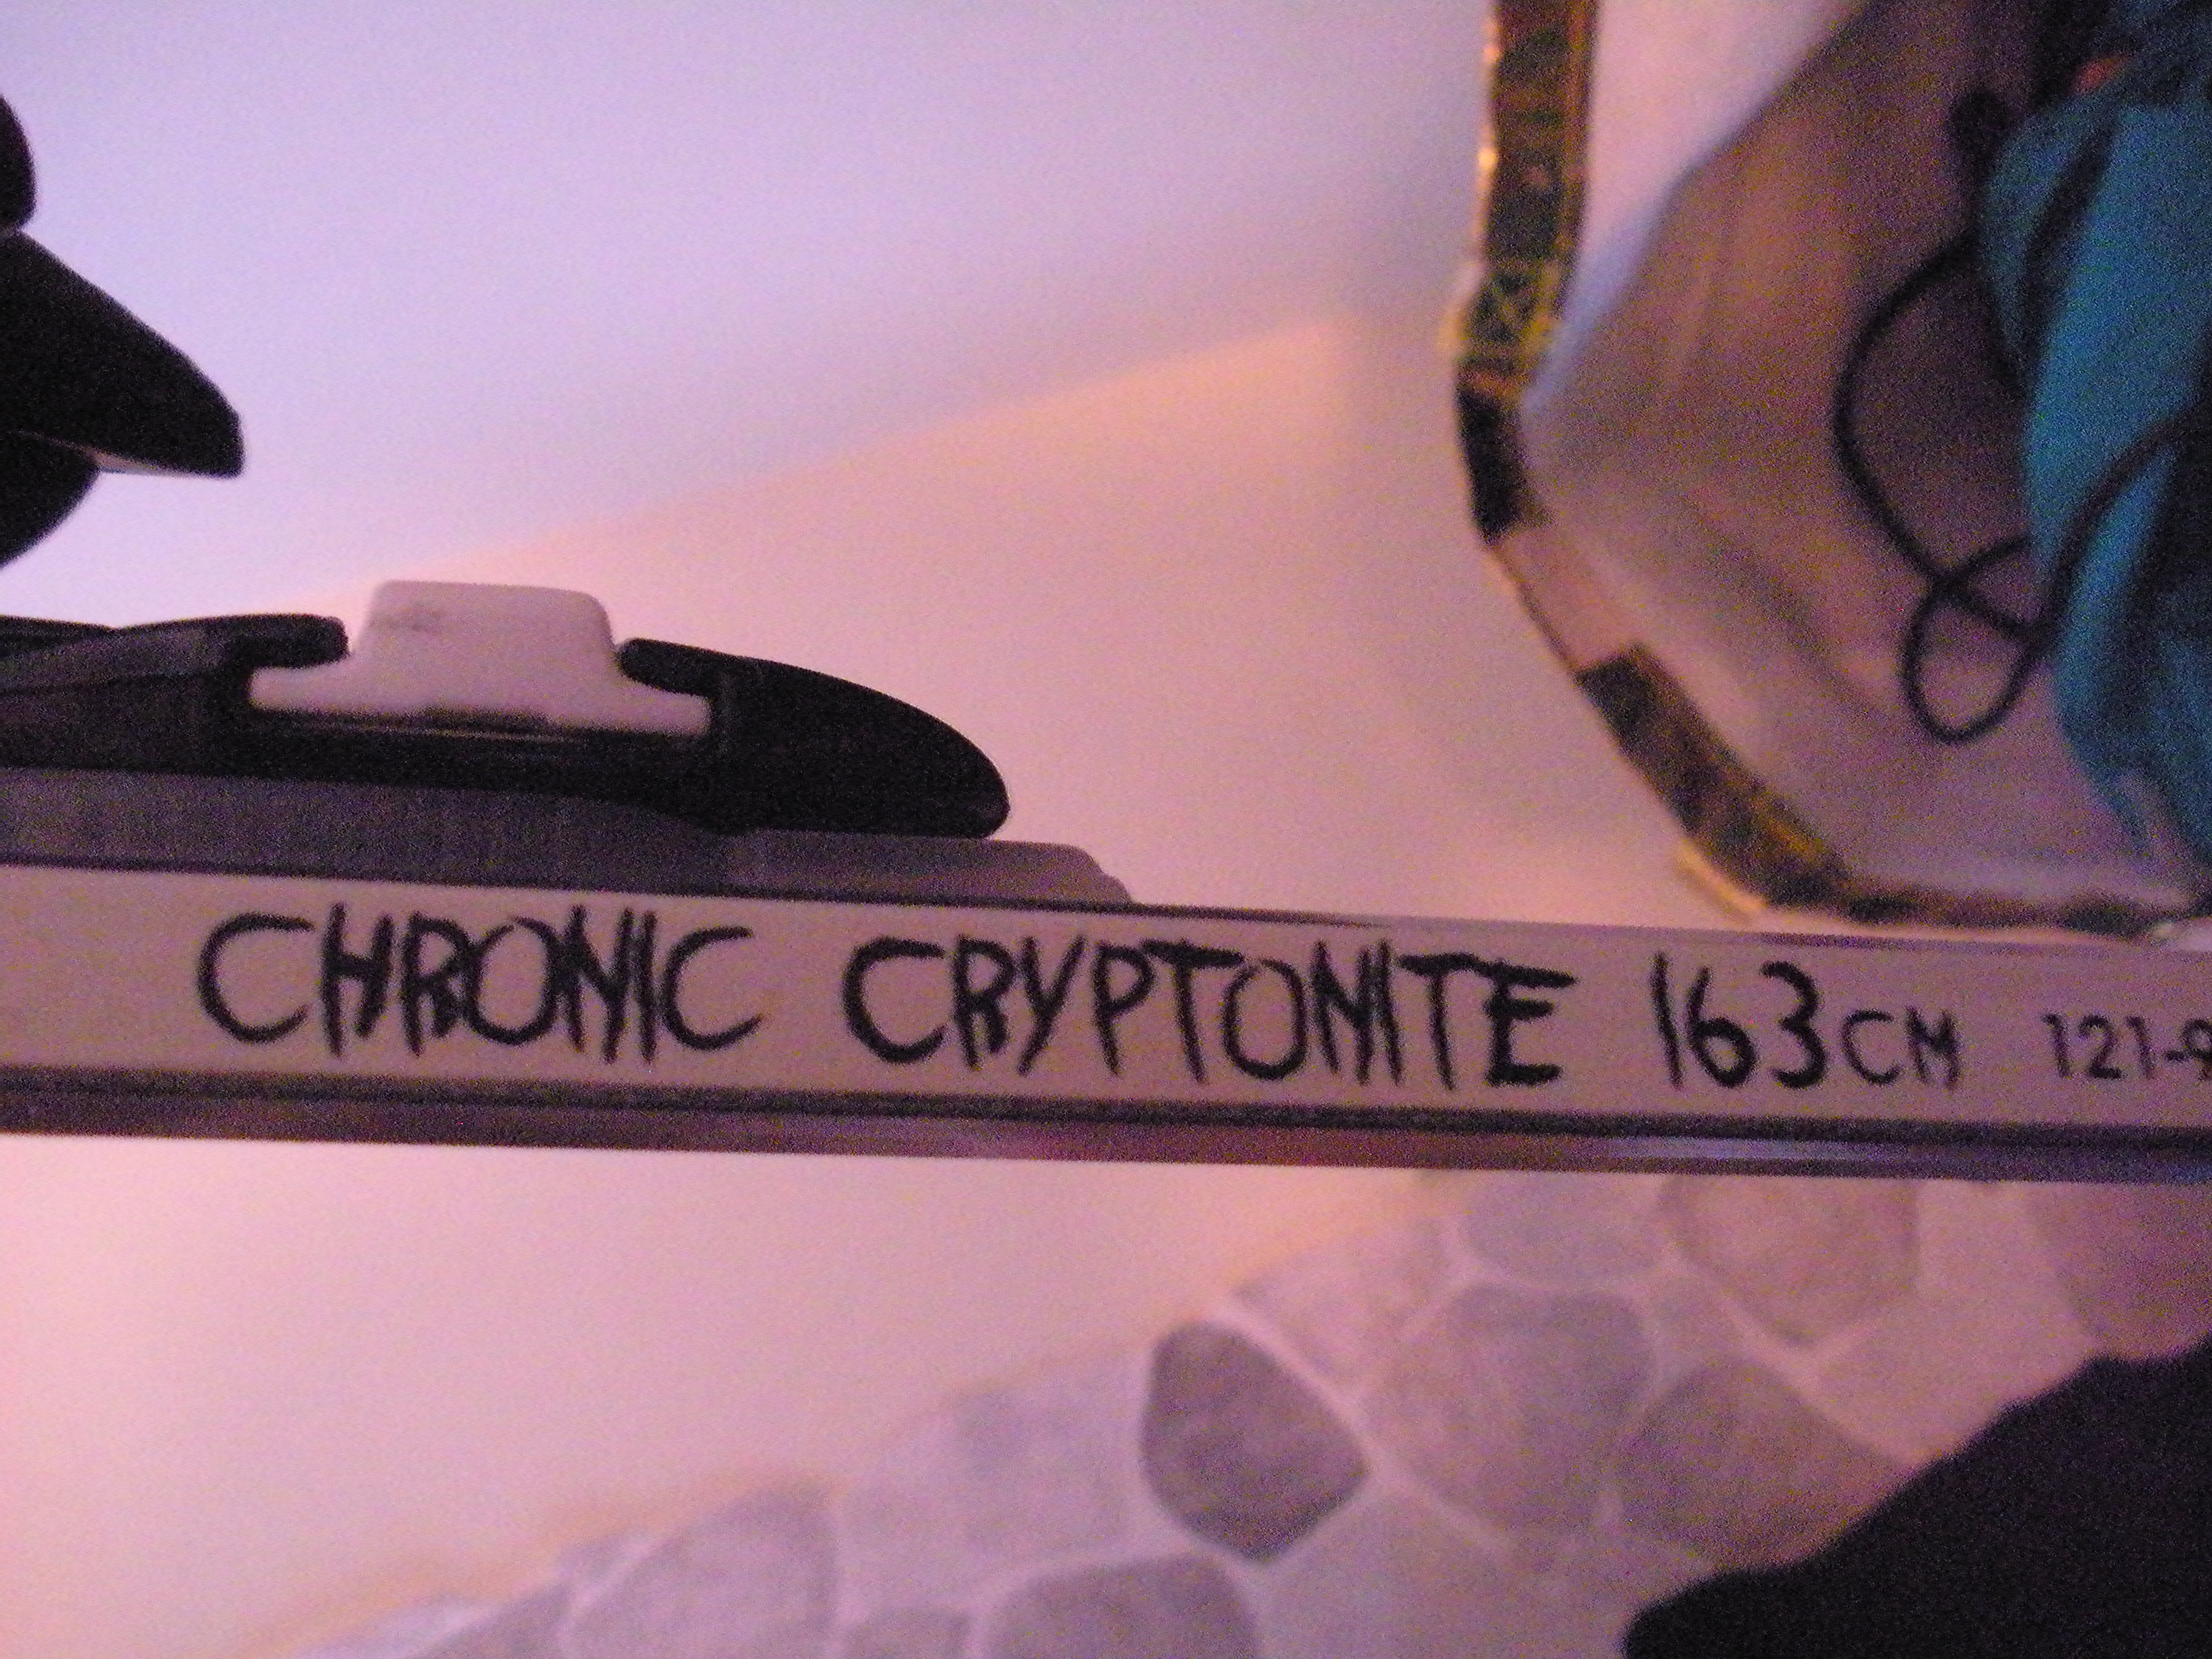 Chronic 2